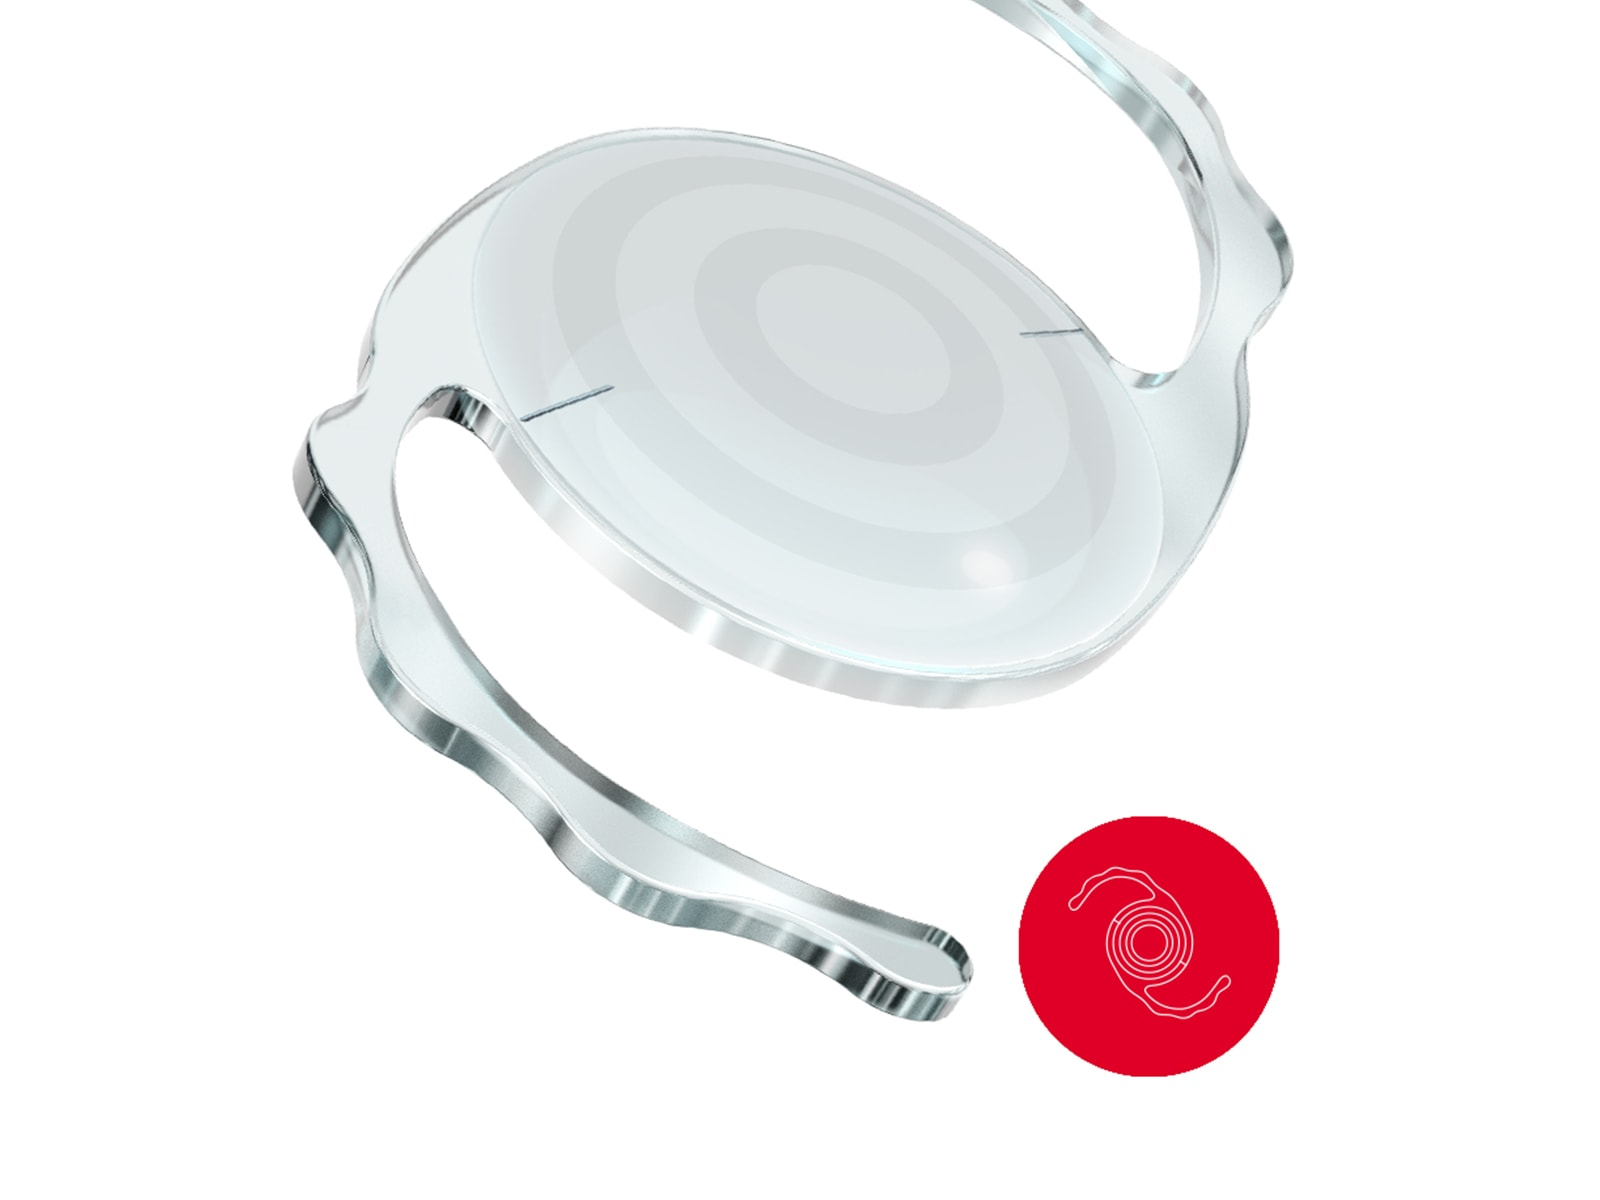 Sulcoflex Multifocal Toric